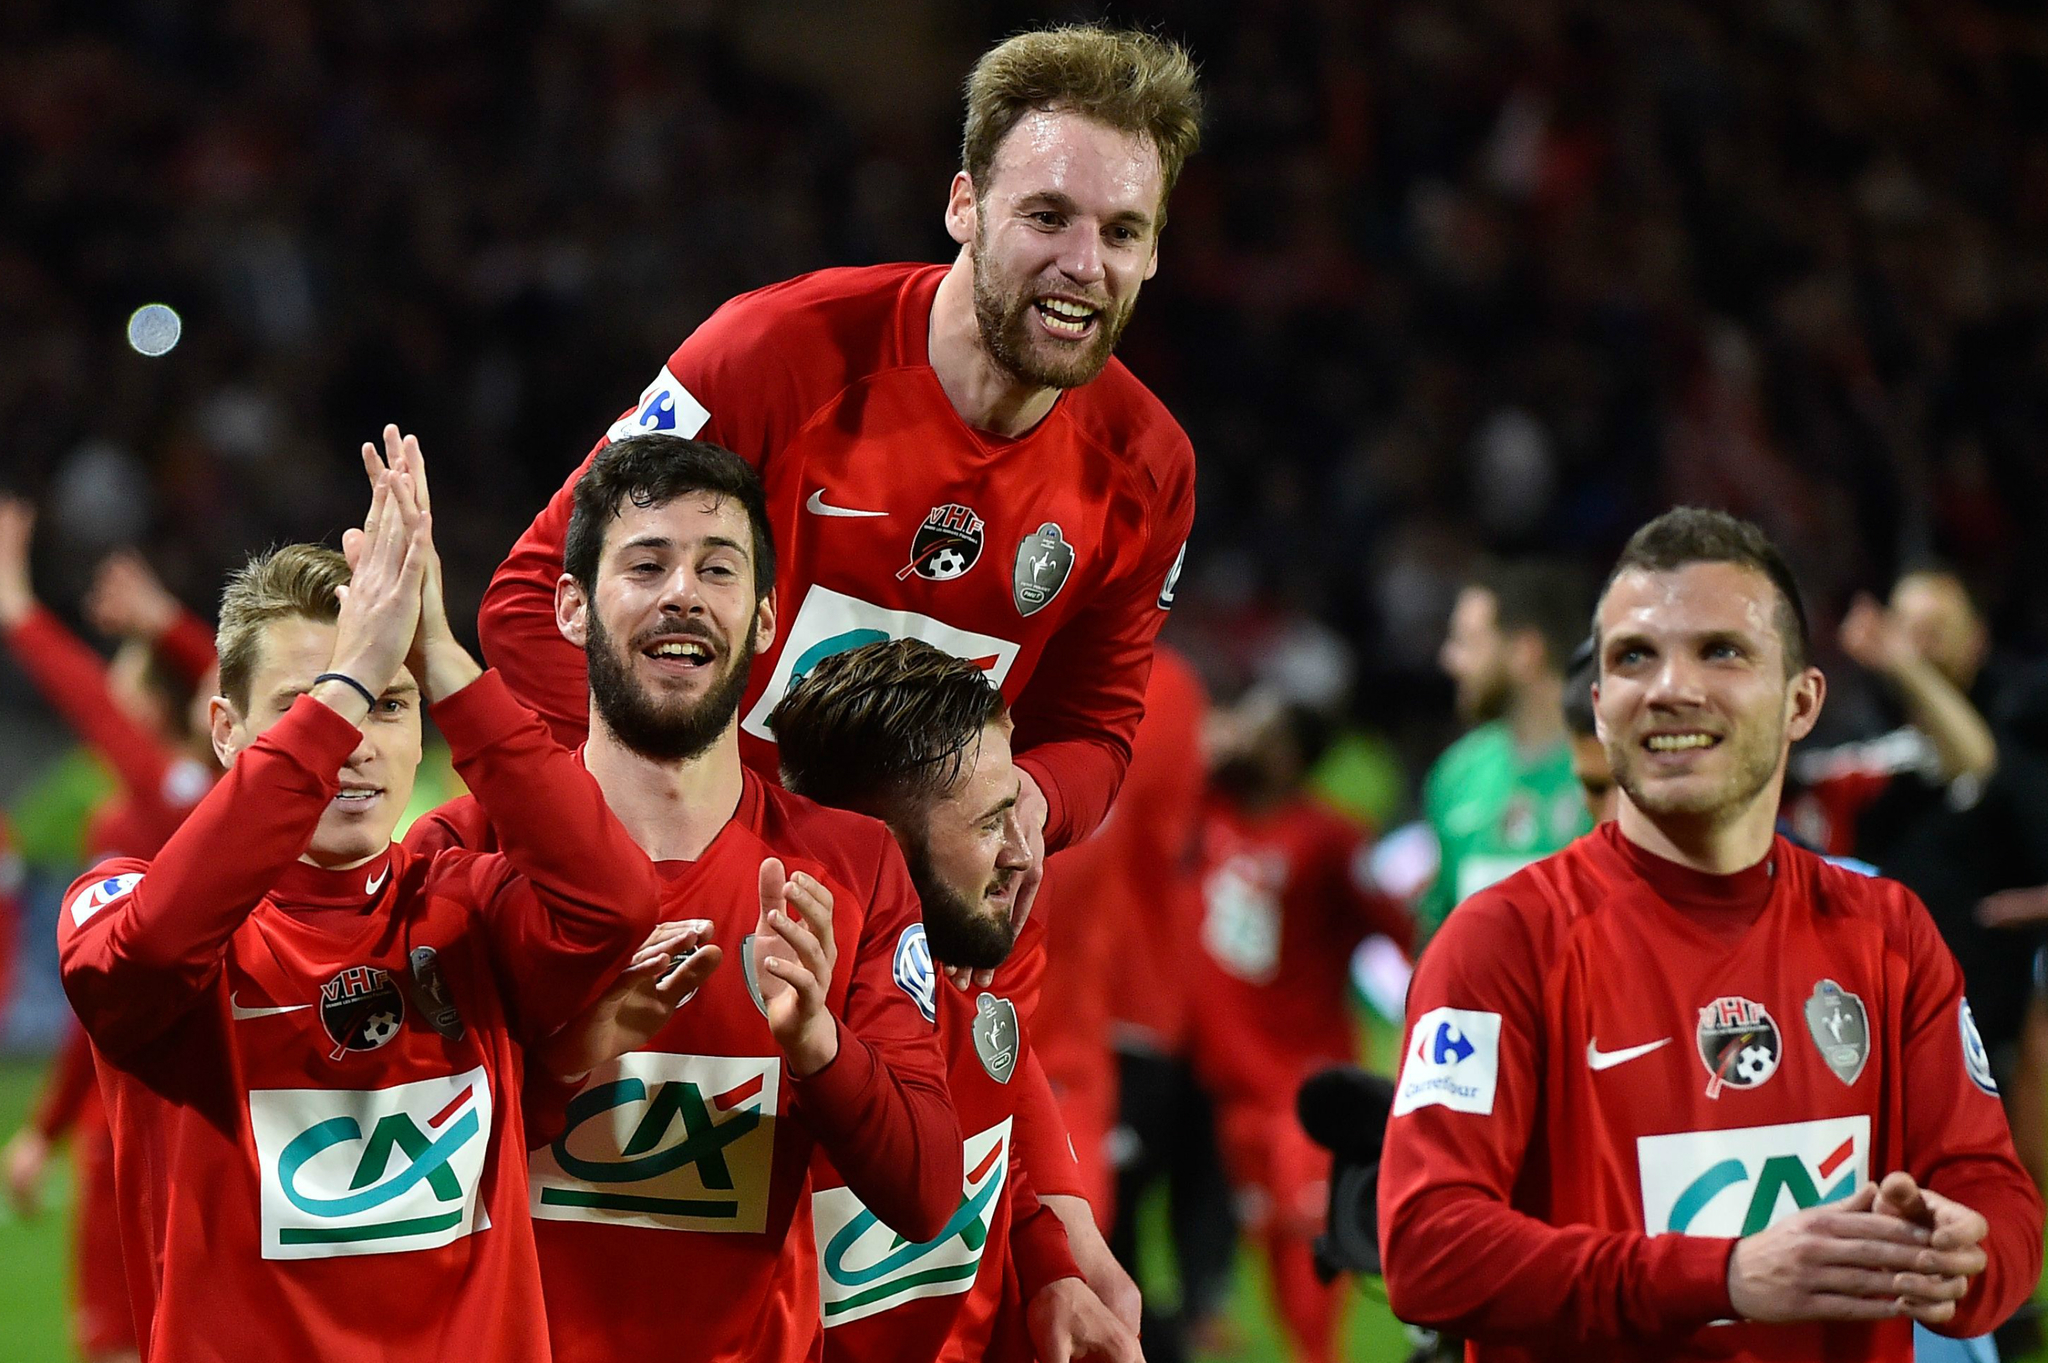 Les Herbiers, tras clasificarse para la final de la Copa francesa